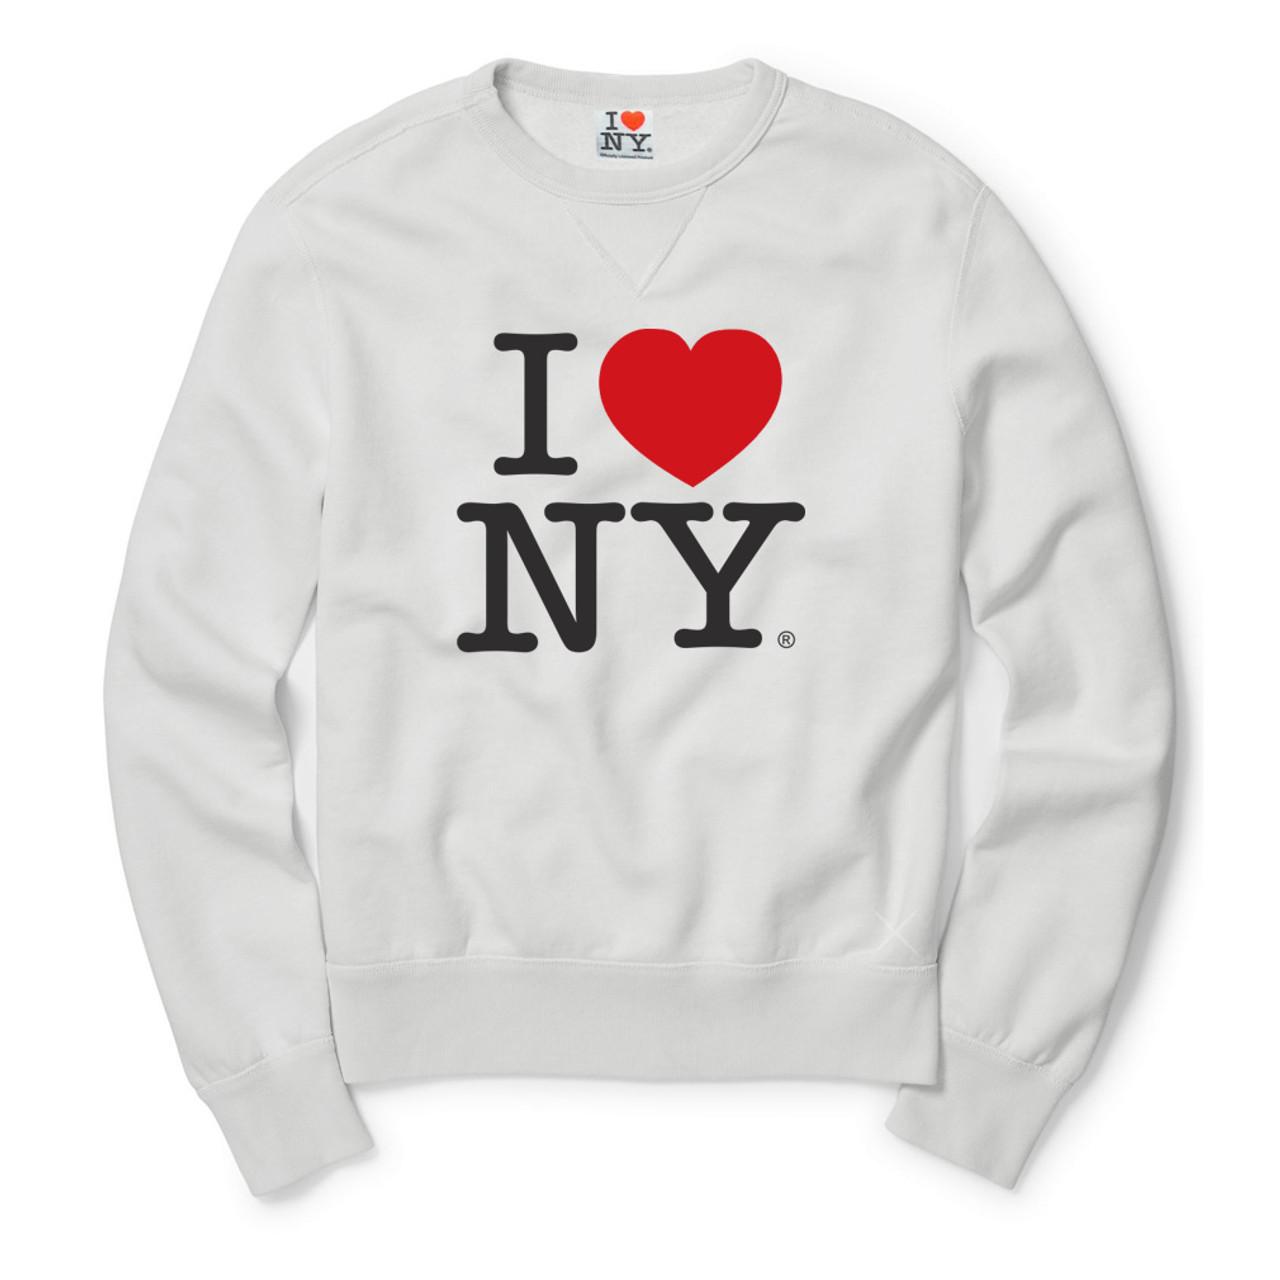 da7161535 White I Love NY Crewneck Sweatshirt. Brand : Clothing